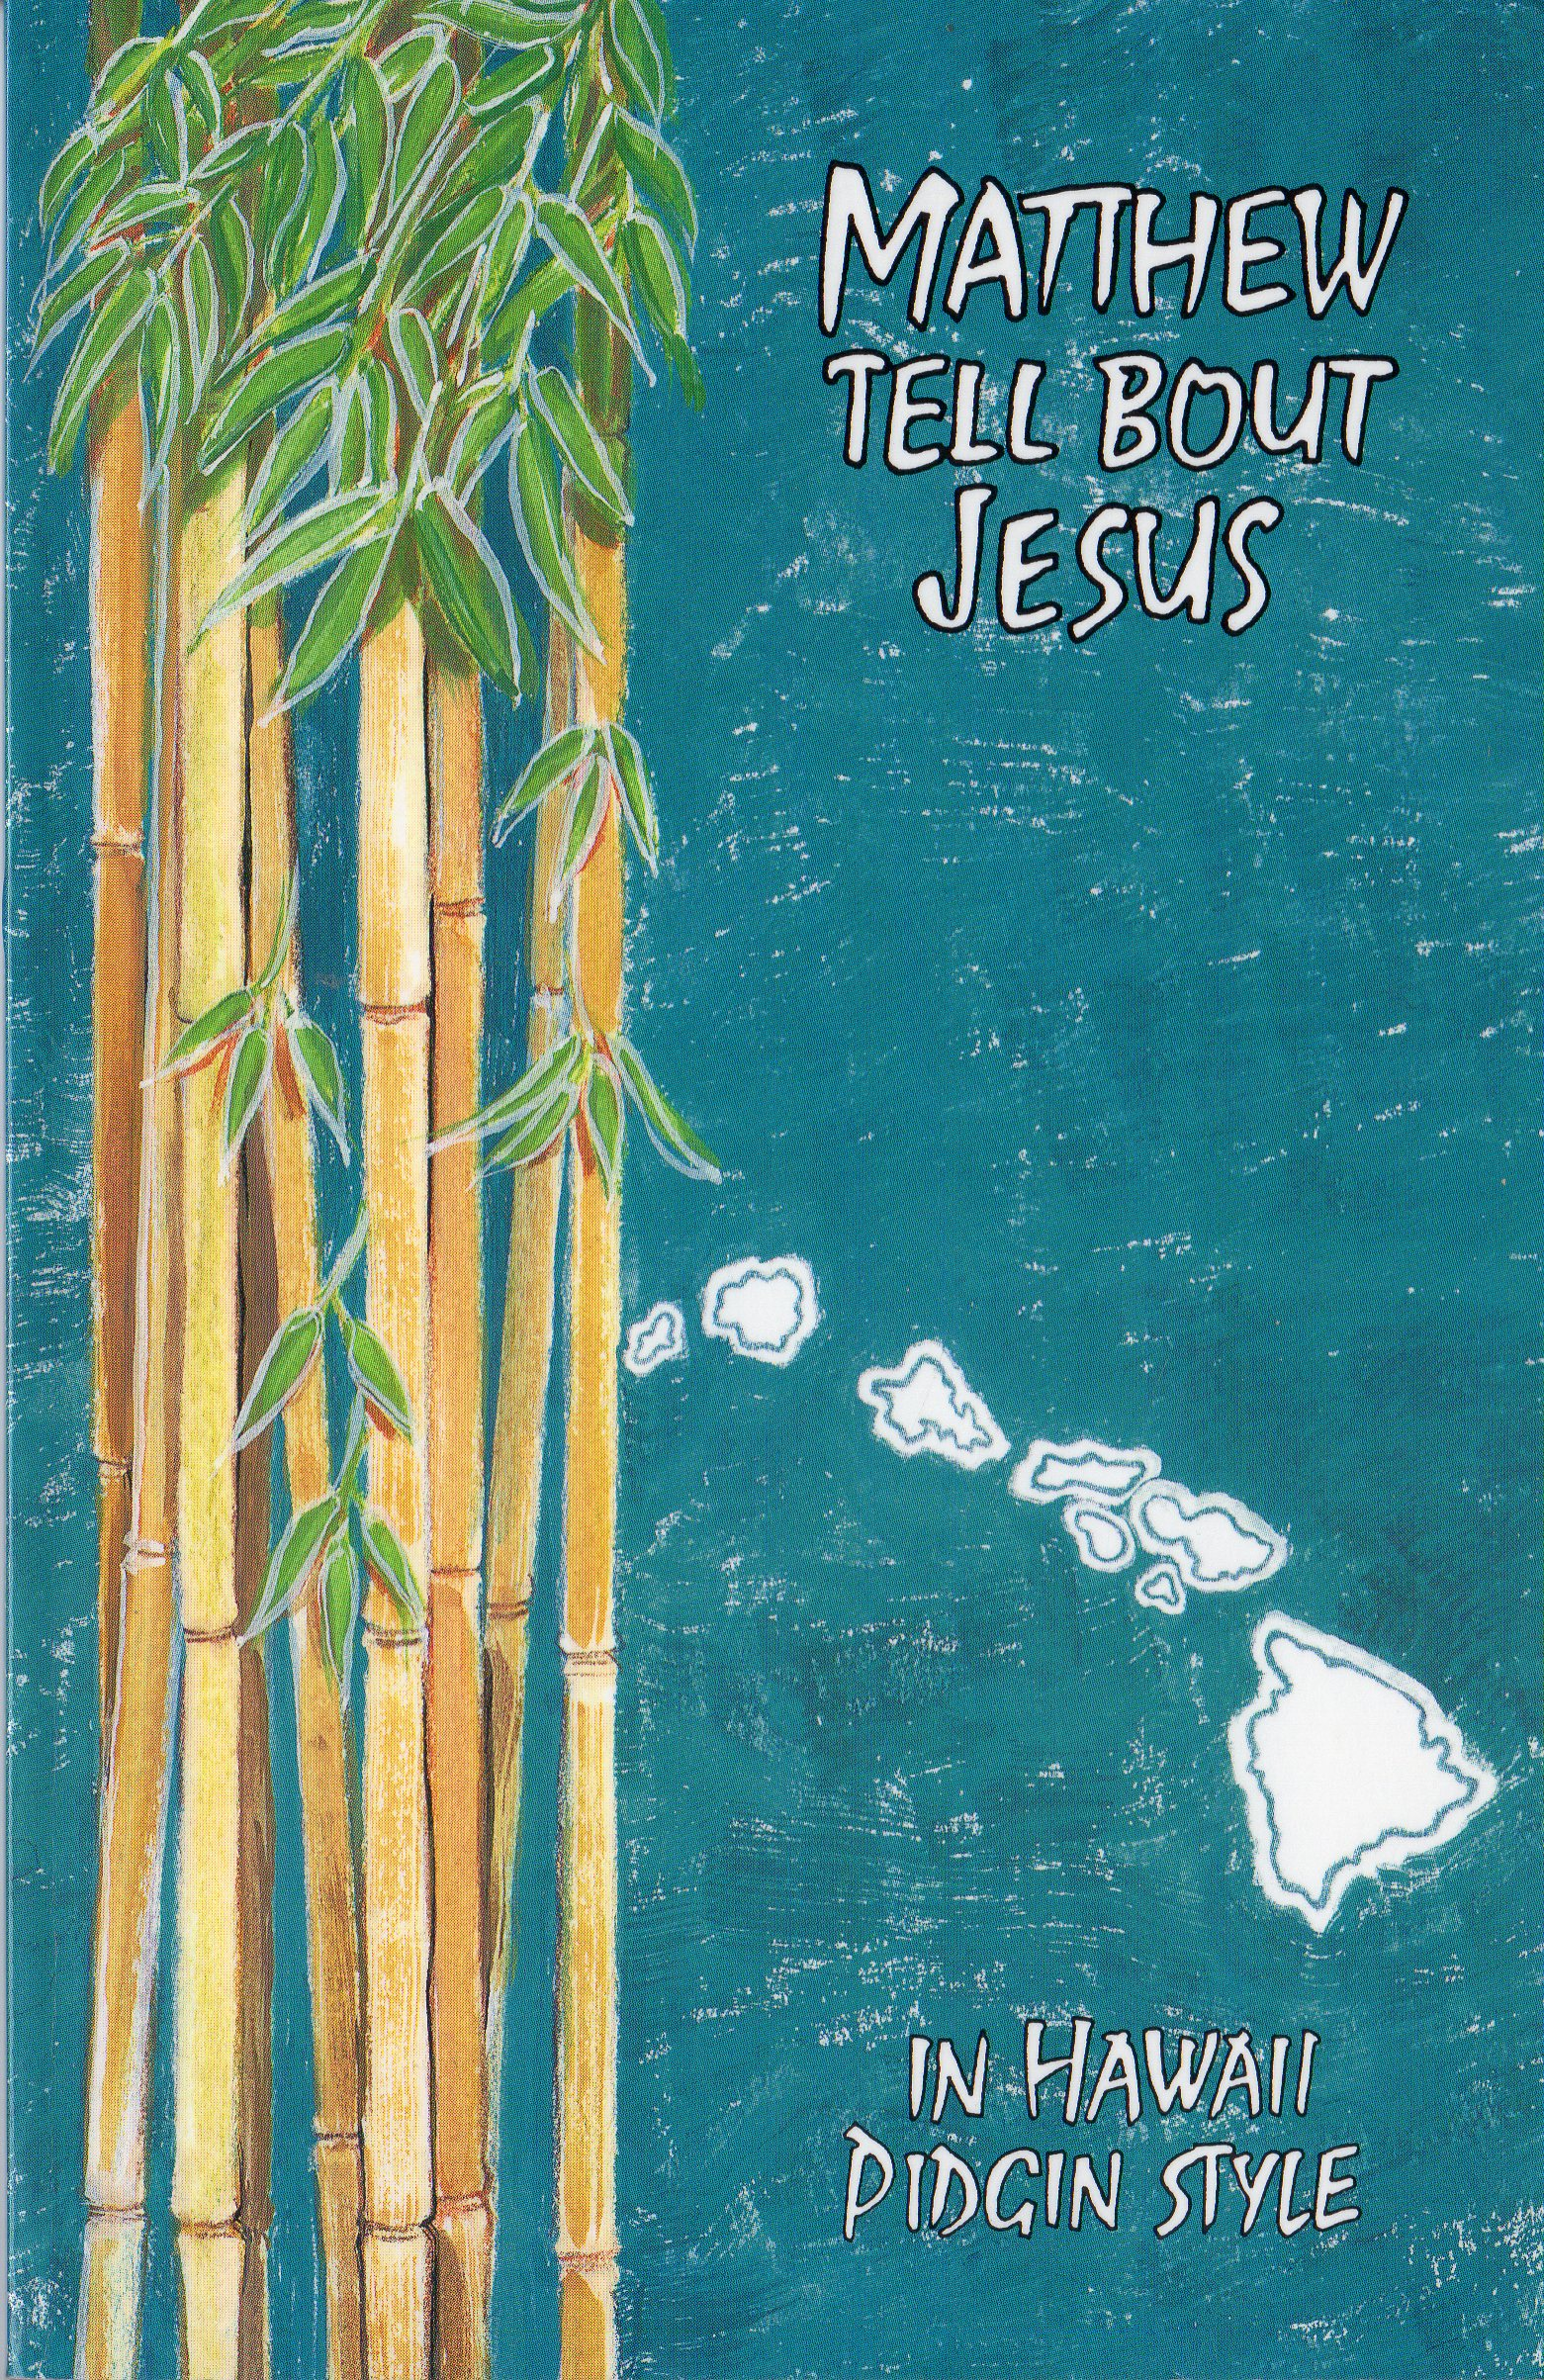 Hawaii Pidgin - Internet Bible Catalog |Pidgin Bible